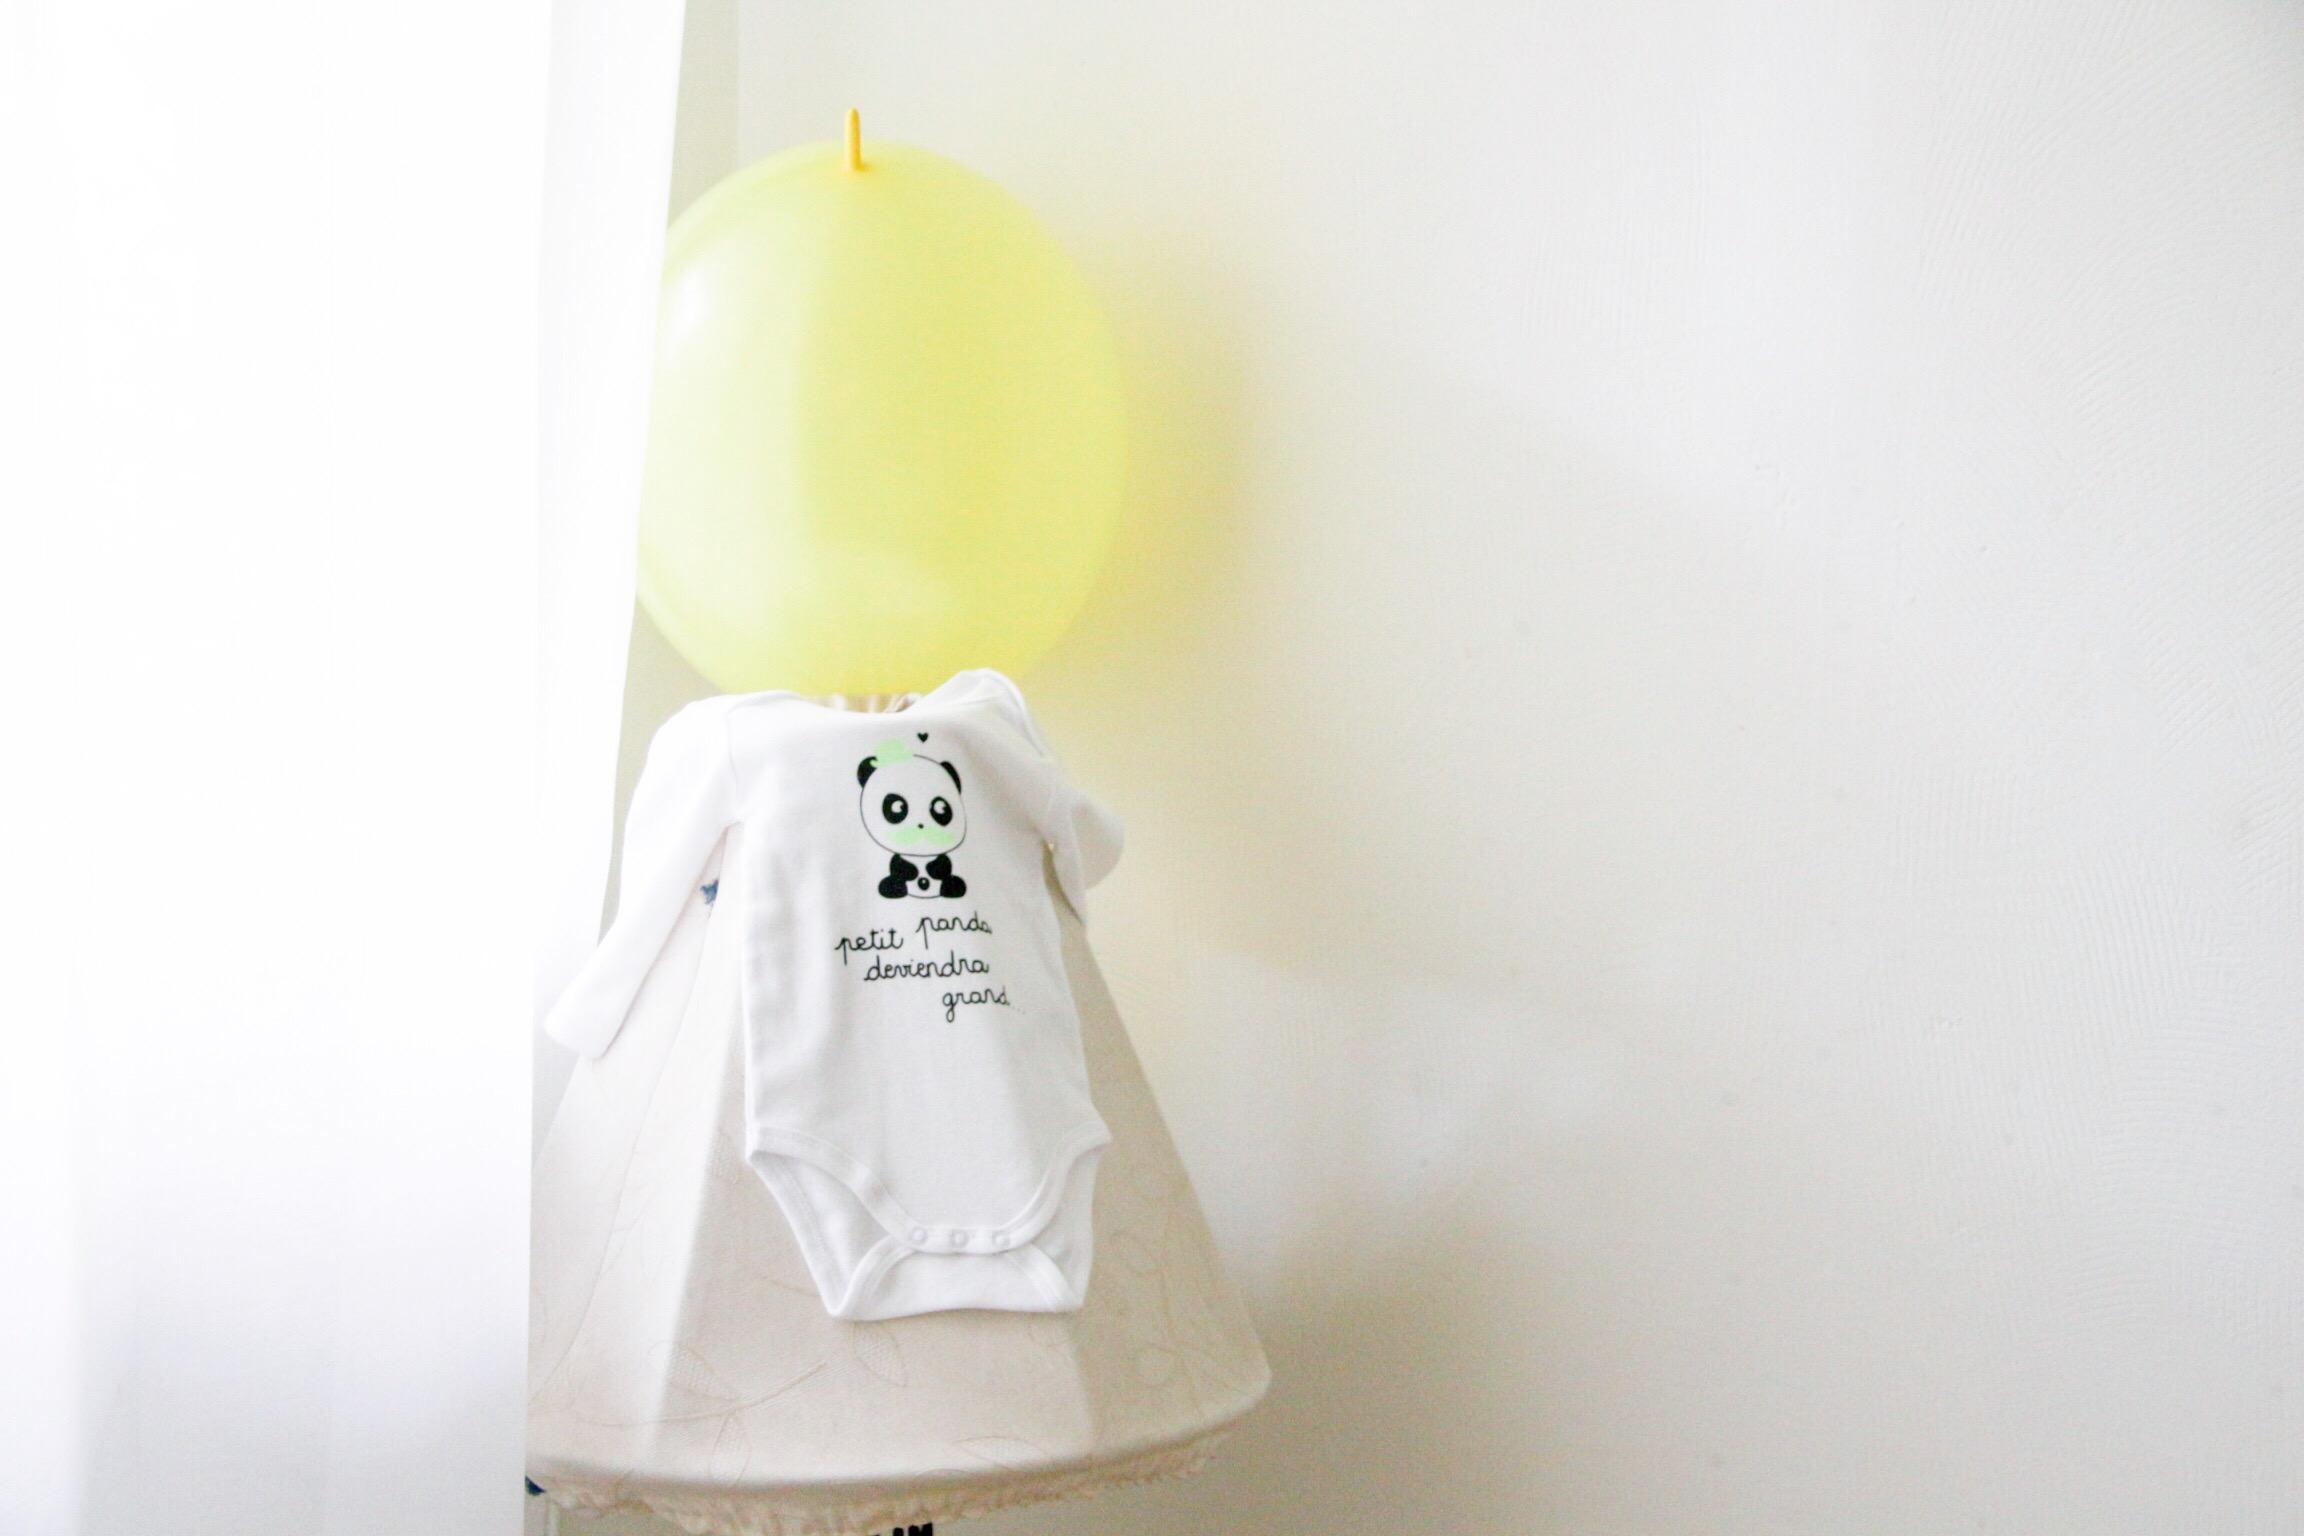 Trysha Gaba - Baby shower 2